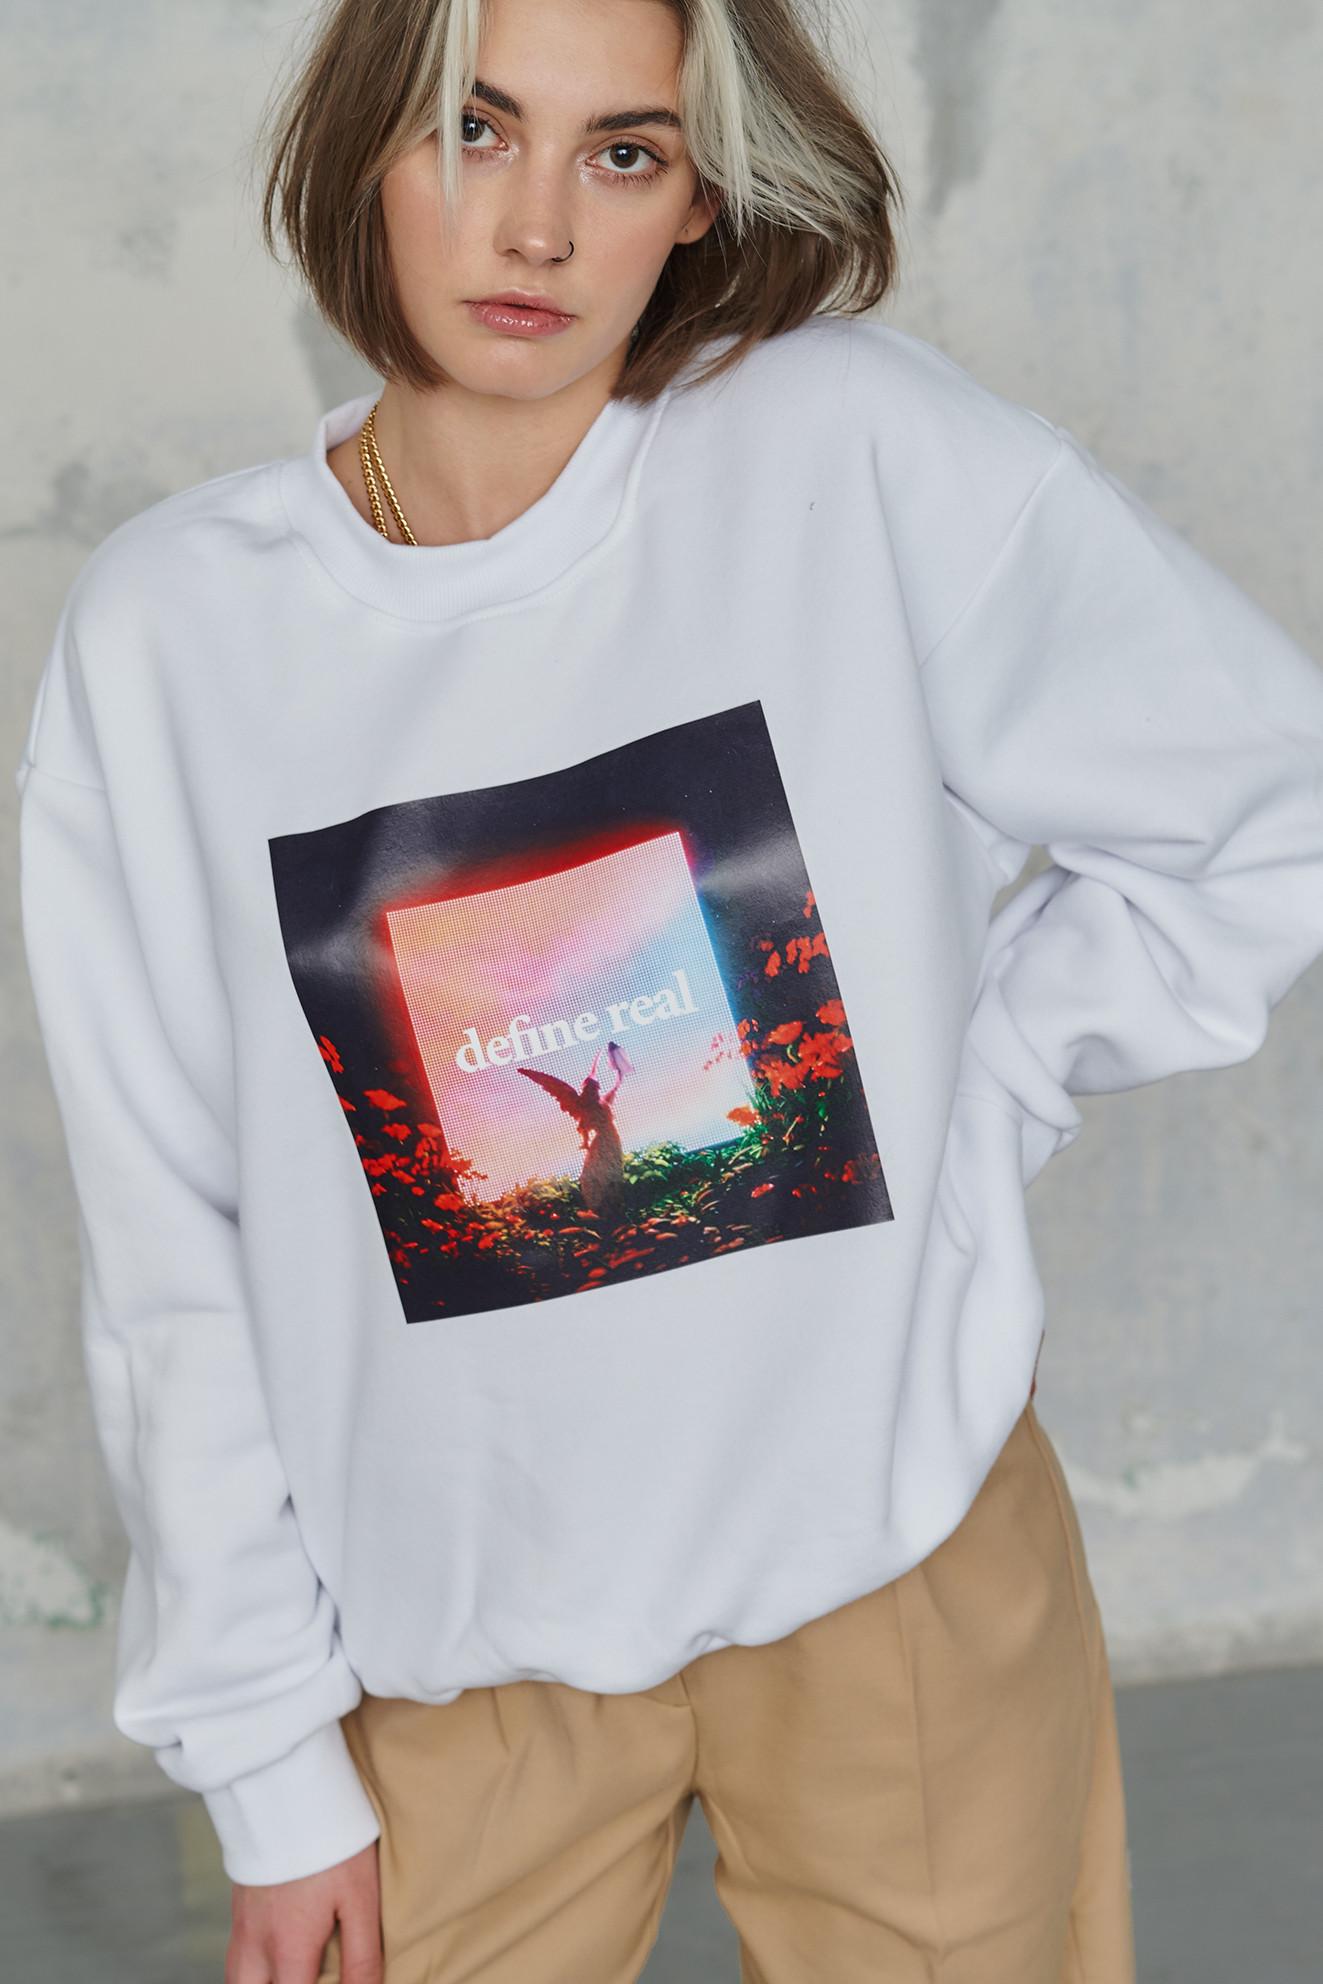 Define Real White Sweatshirt - whysoserious   JestemSlow.pl